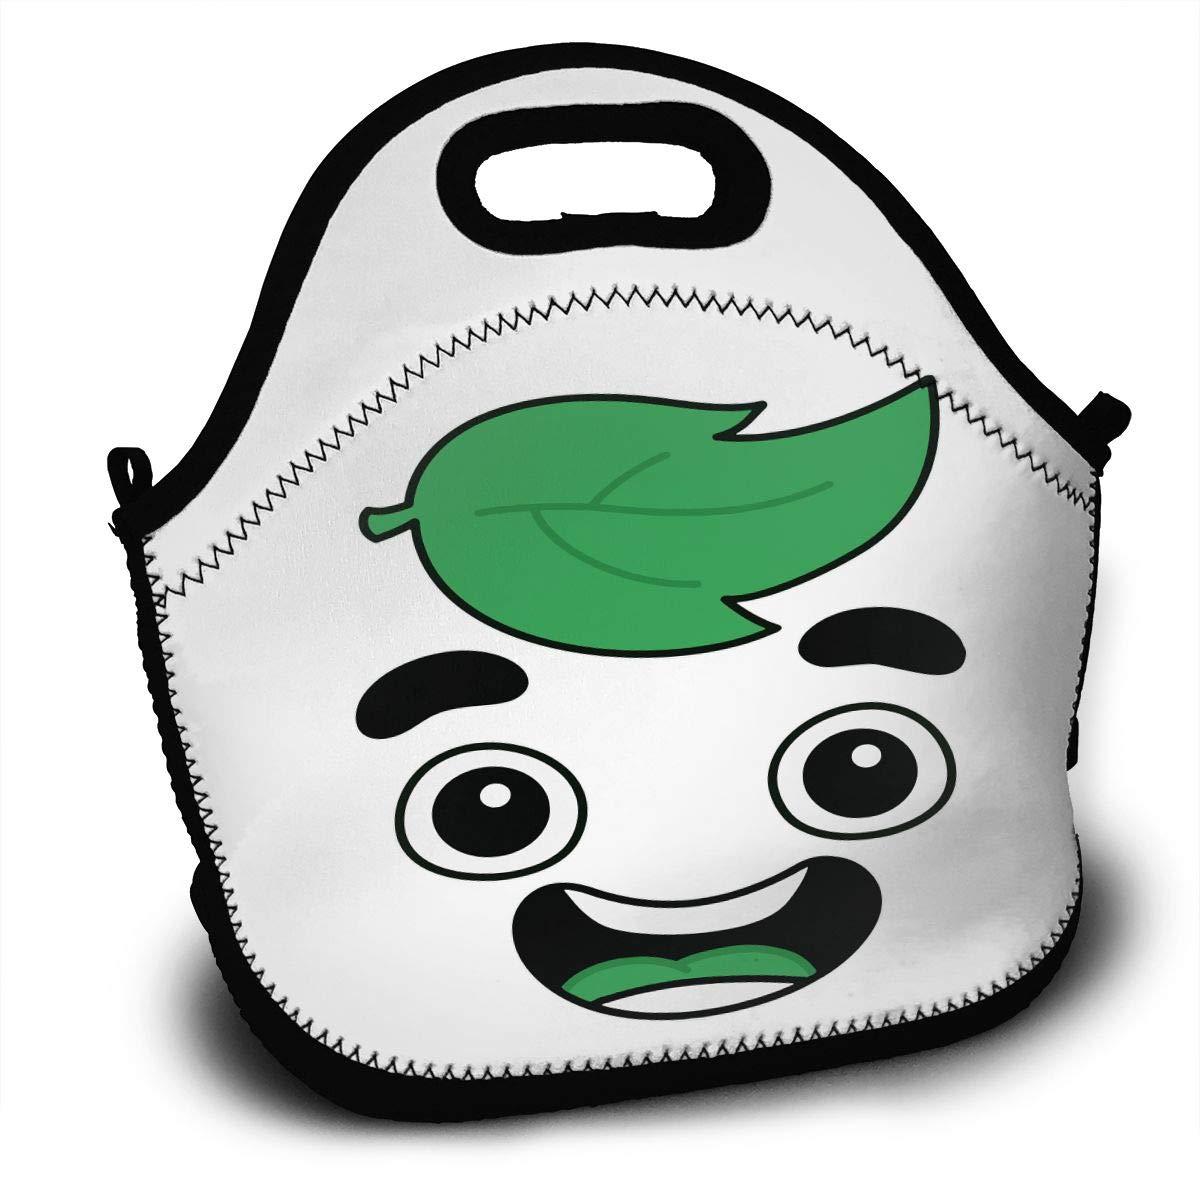 1f1afd04e610 Amazon.com - Sunmoonet Lunch Tote Bag Guava Juice Face Cotton Bento ...